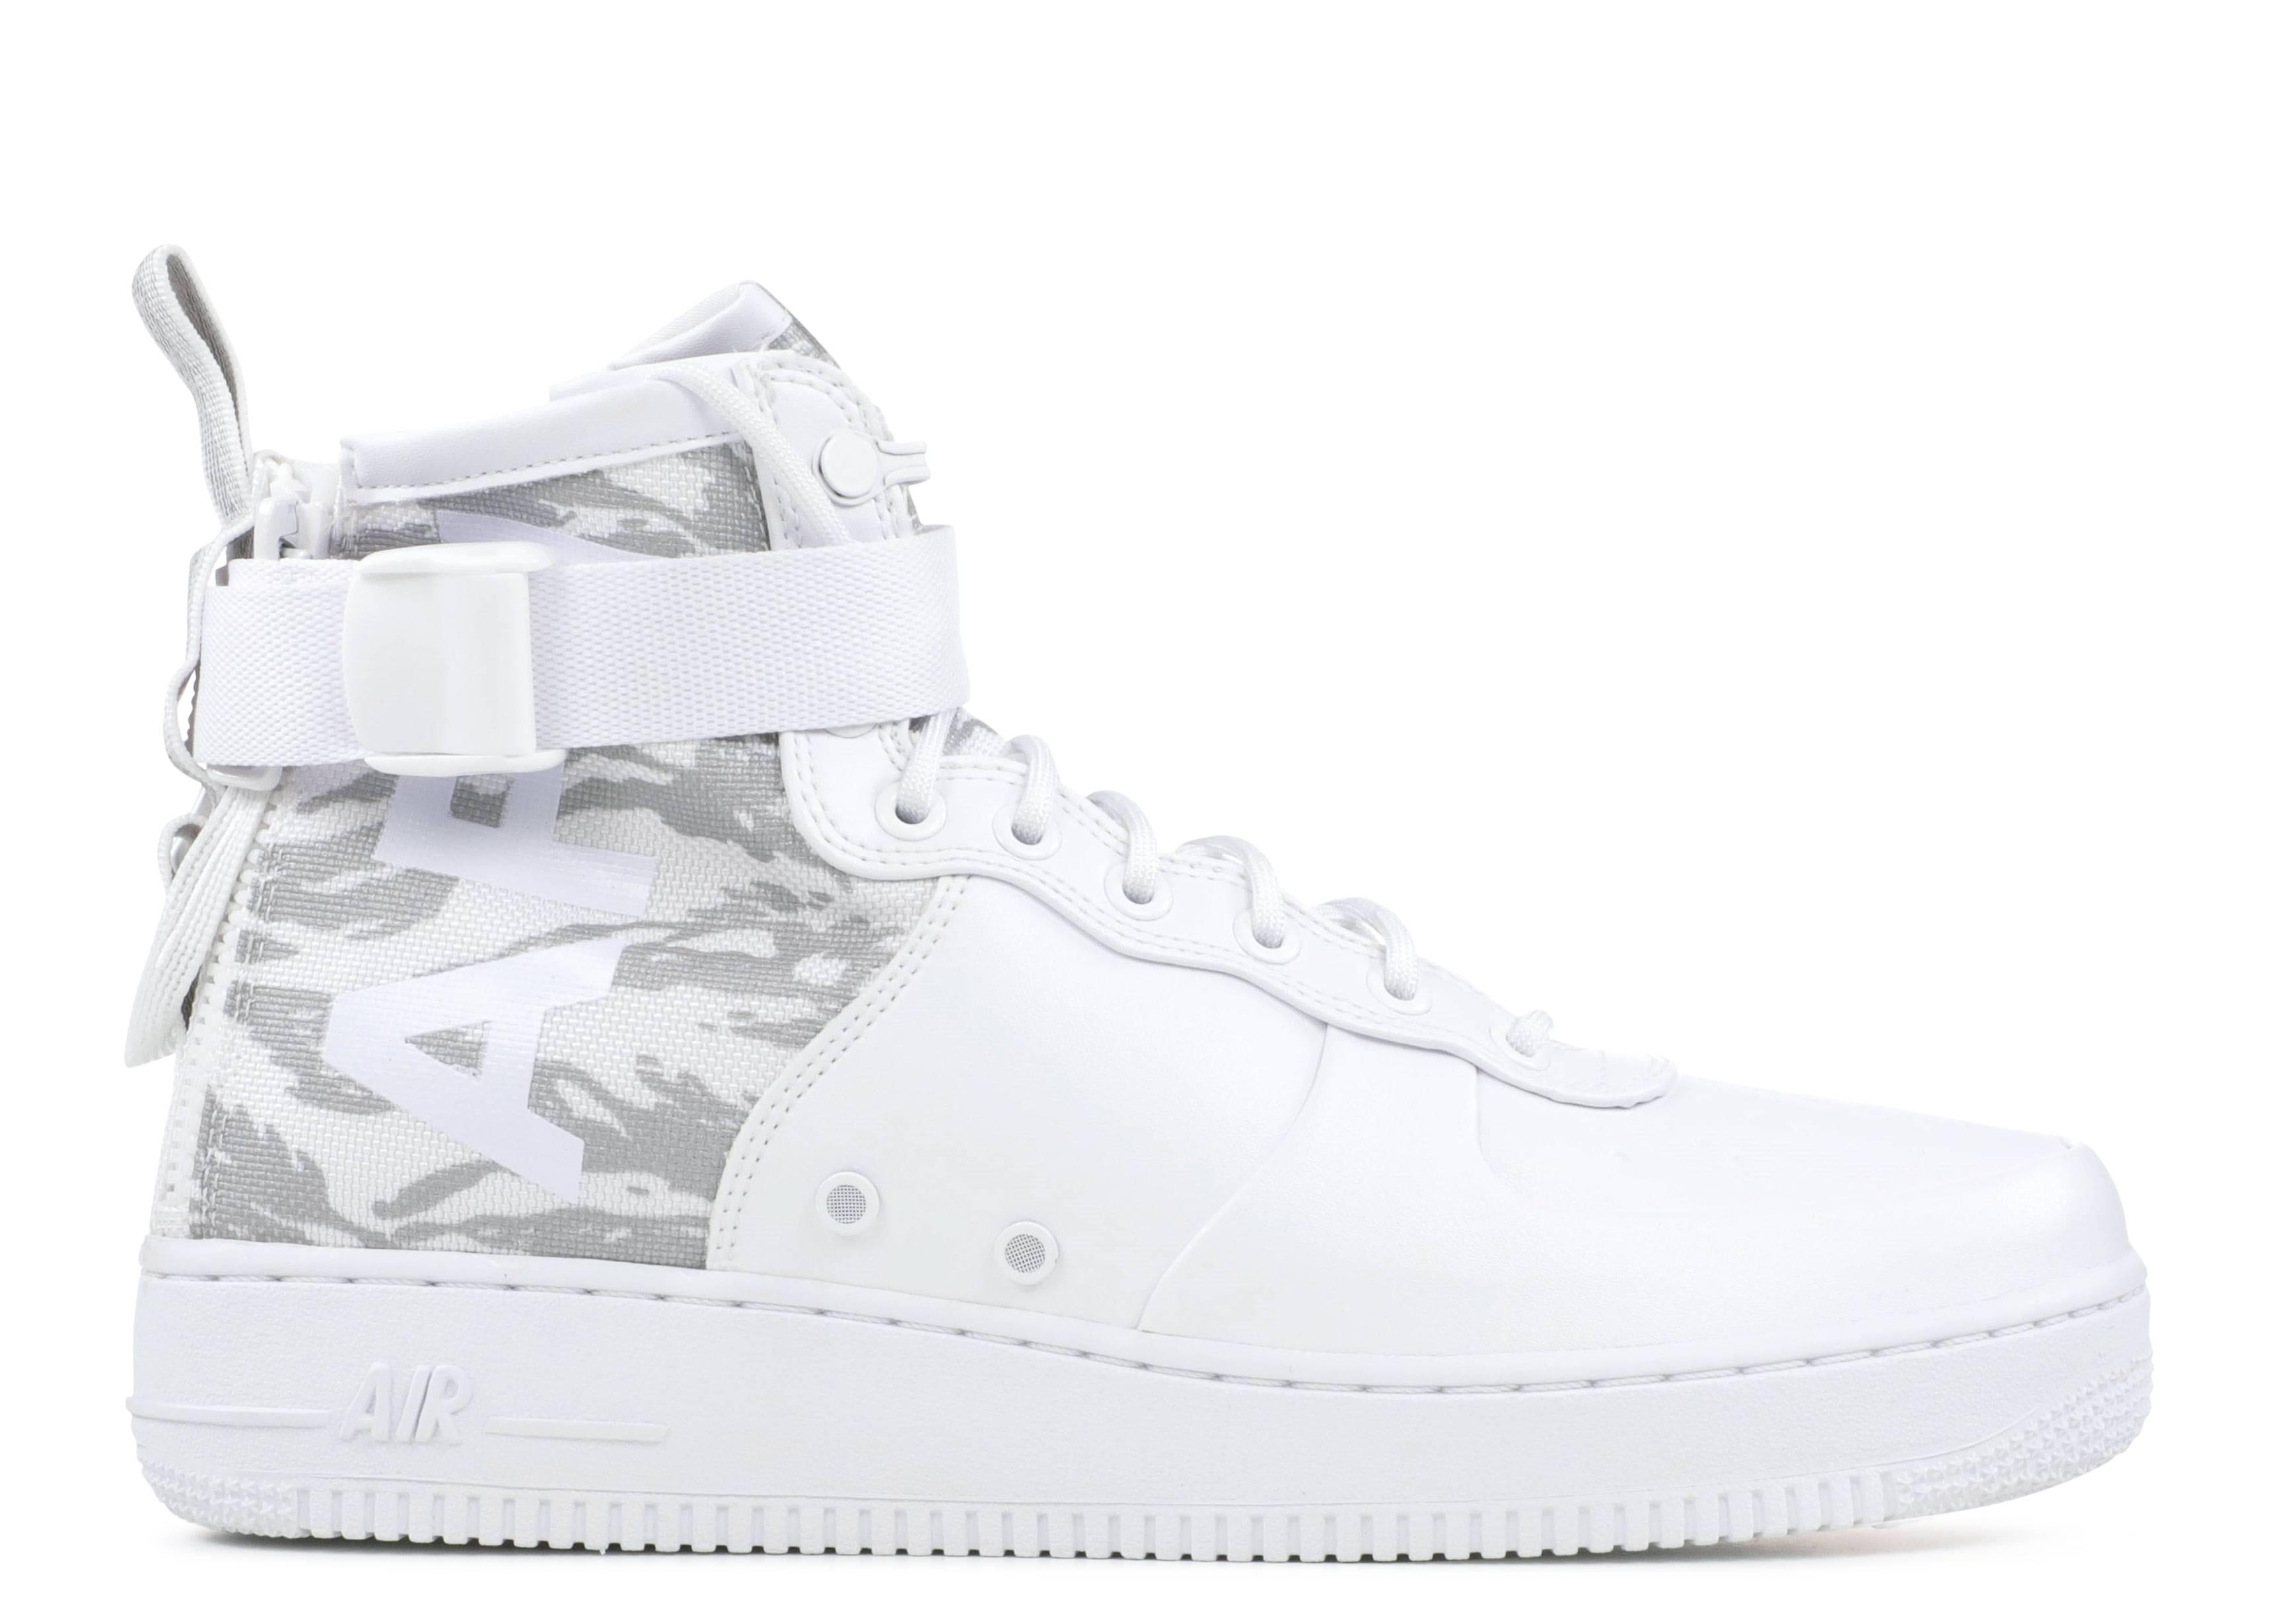 Sf Af1 Mid Prm - Nike - AA1129 100 - white white-cargo khaki   Flight Club 0b9b2e7f1d27